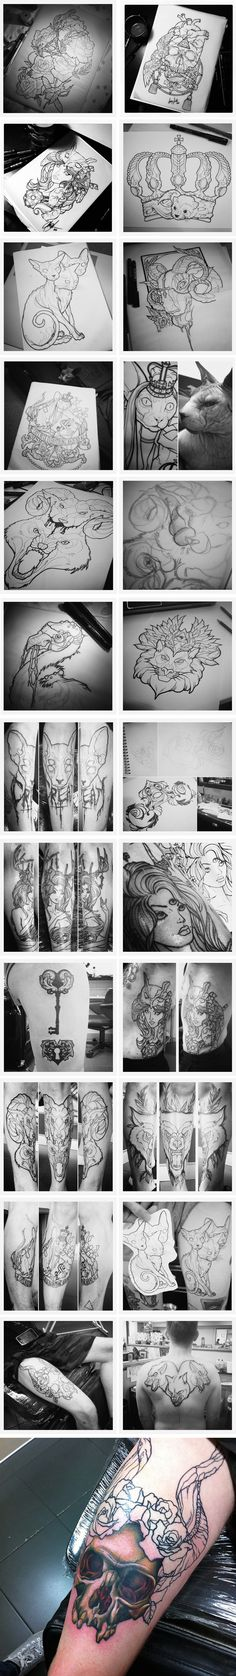 Sara Fabel Art